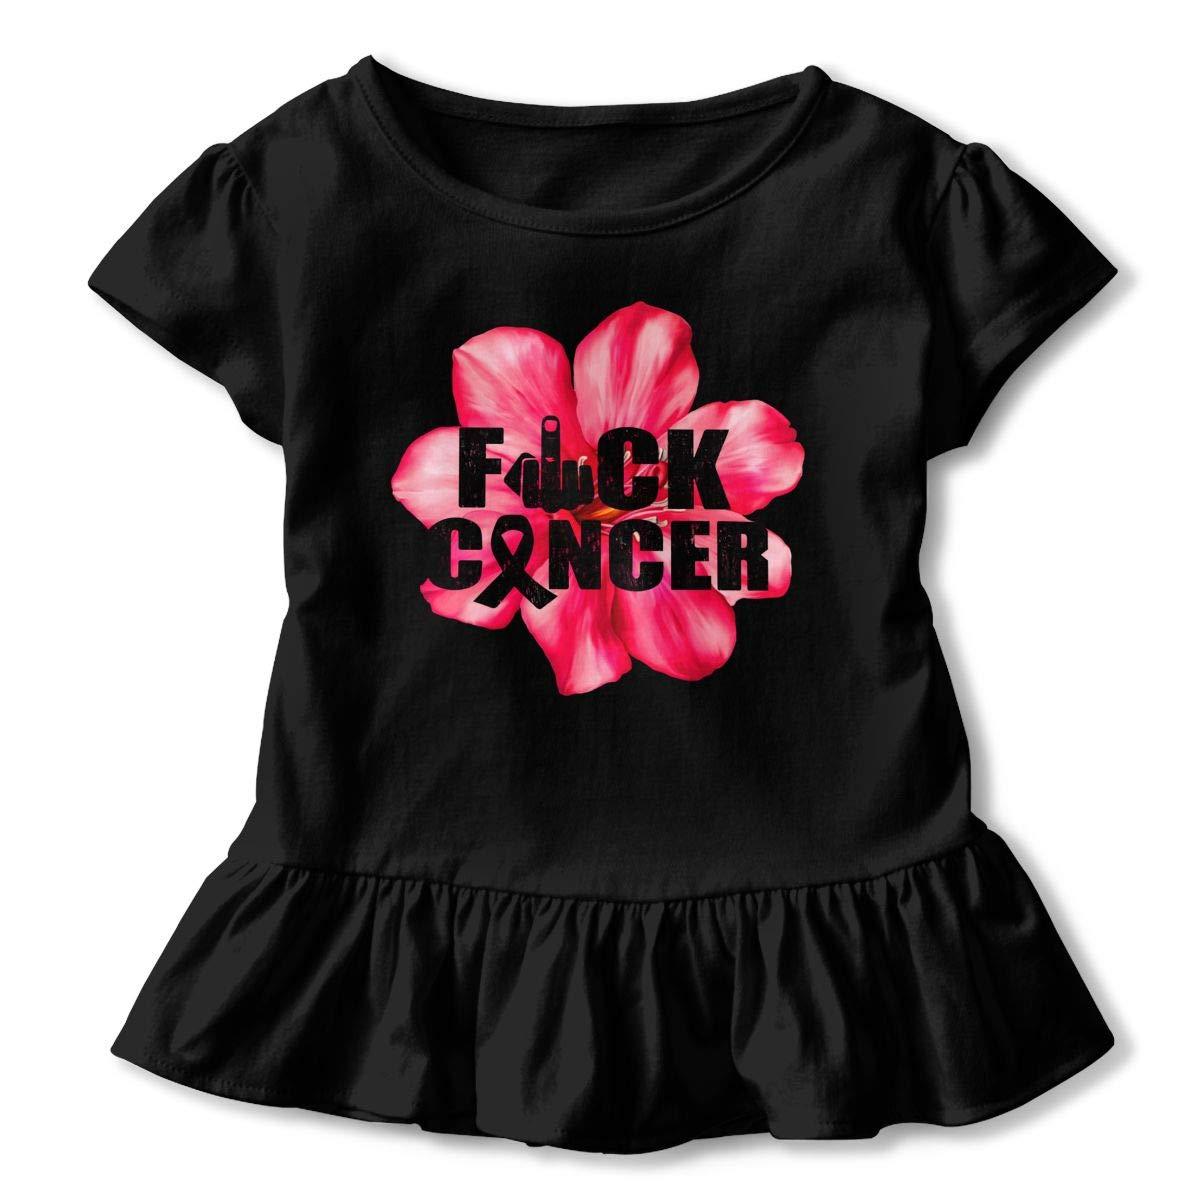 CZnuen Fuck Cancer Flower 2-6T Baby Girls Cotton Jersey Short Sleeve Ruffle Tee